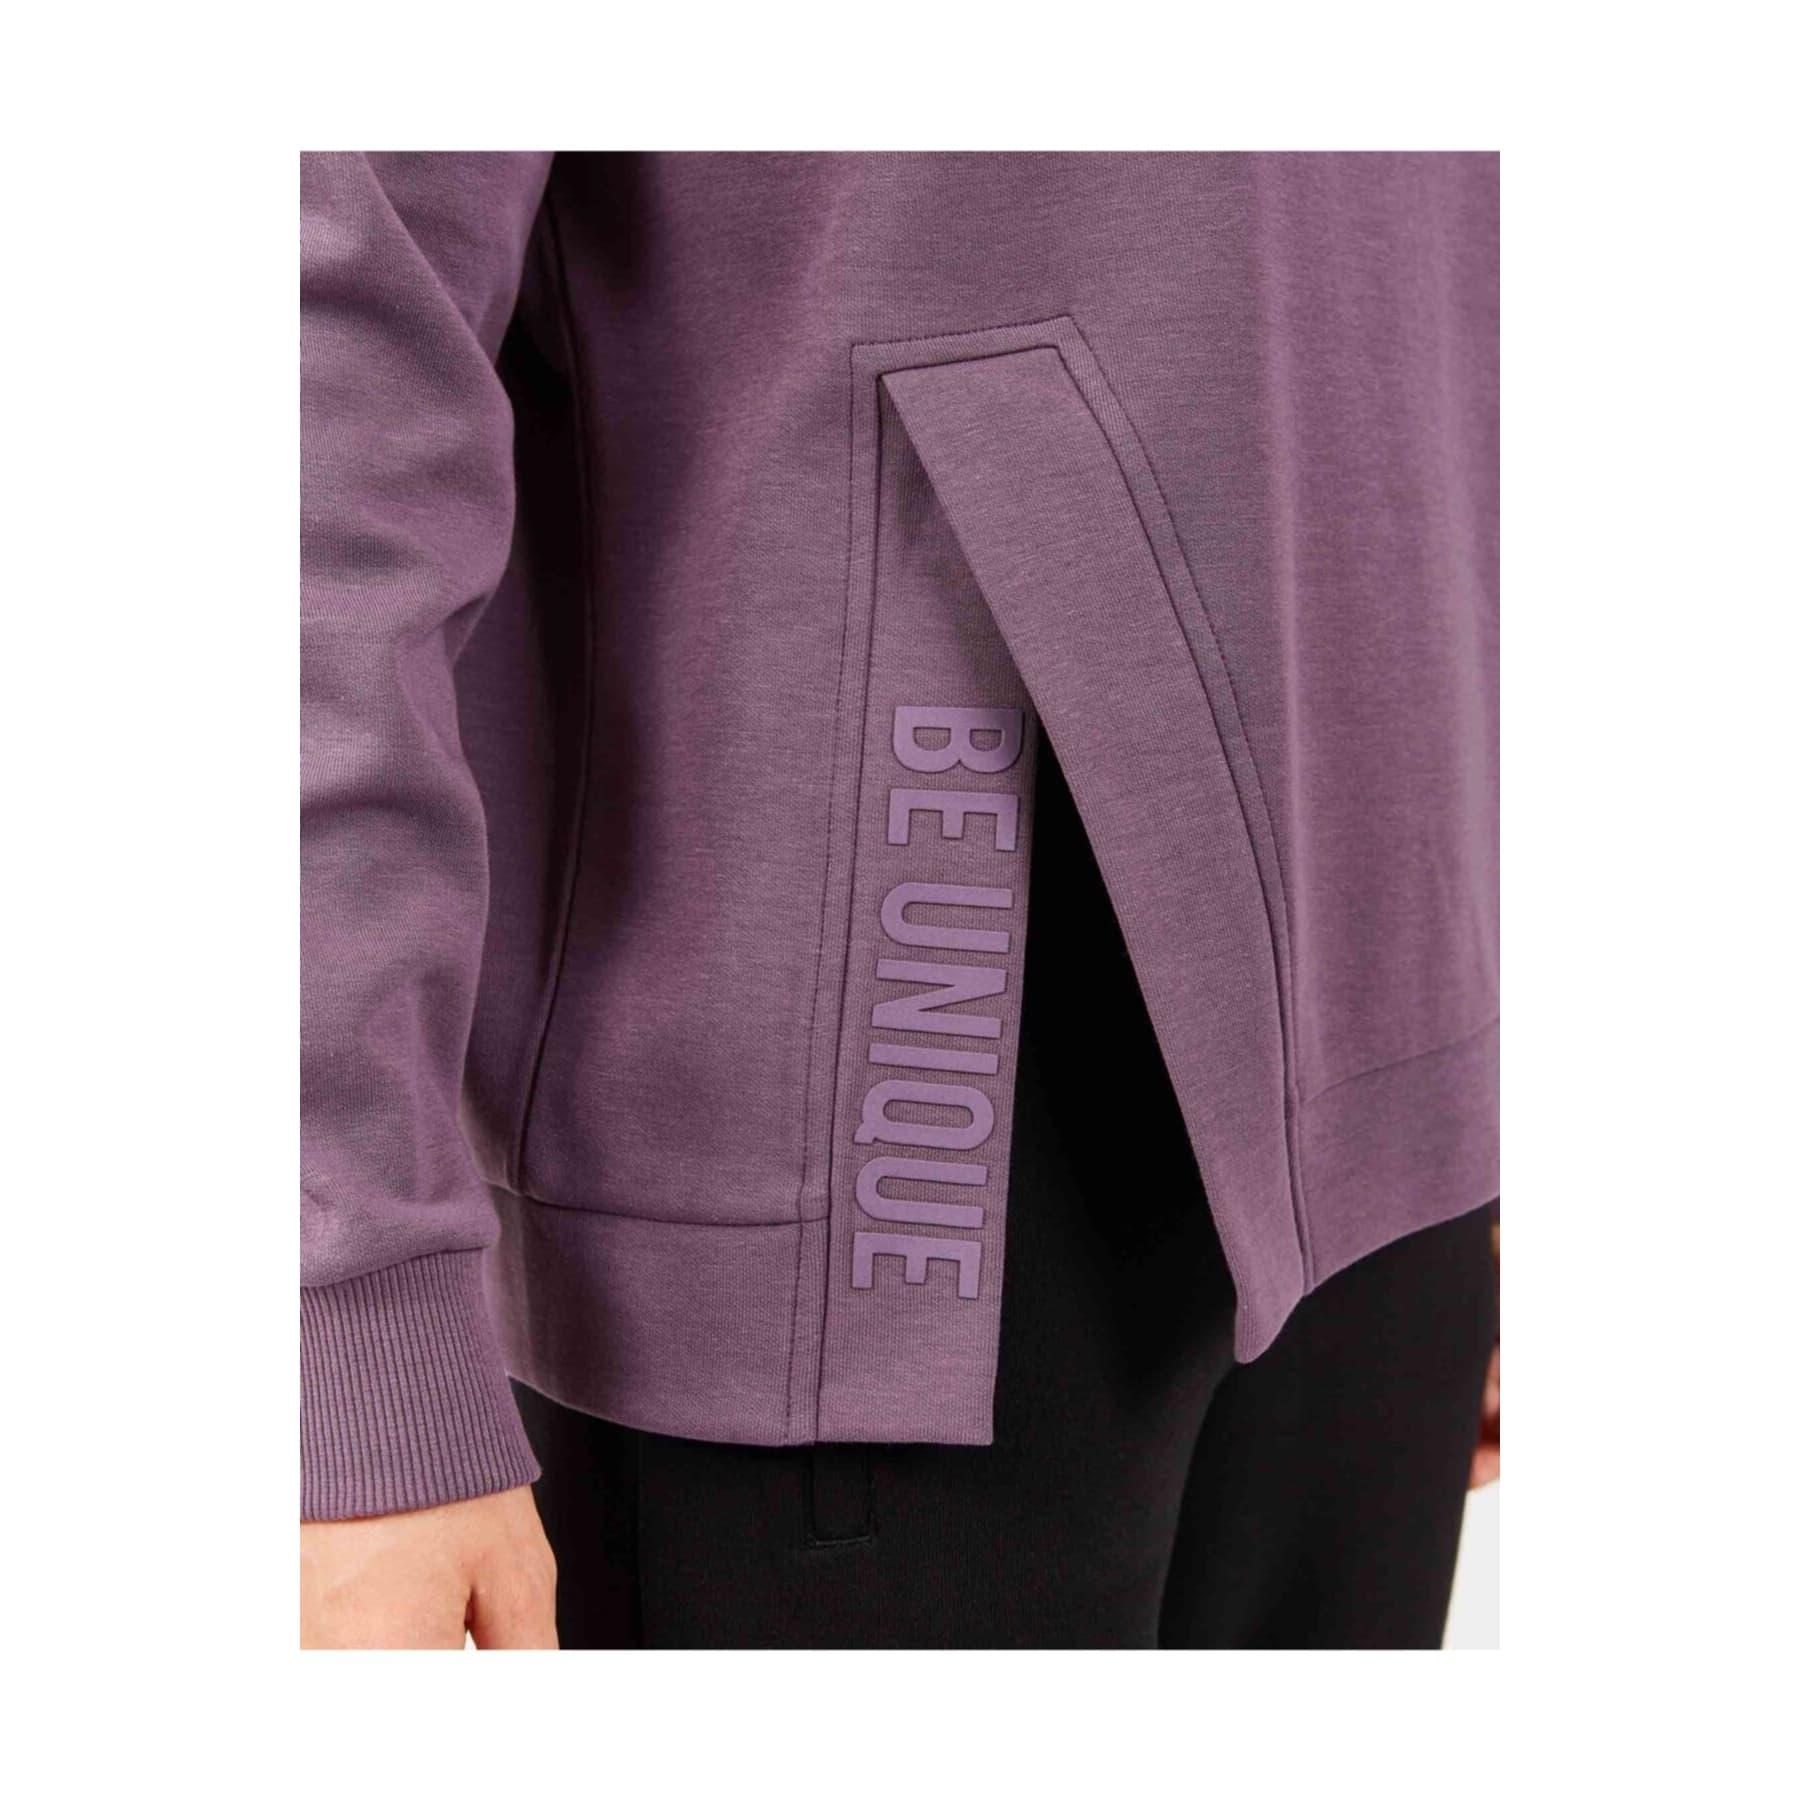 2X I-Lock Printed Kadın Mor Sweatshirt (S202051-499)